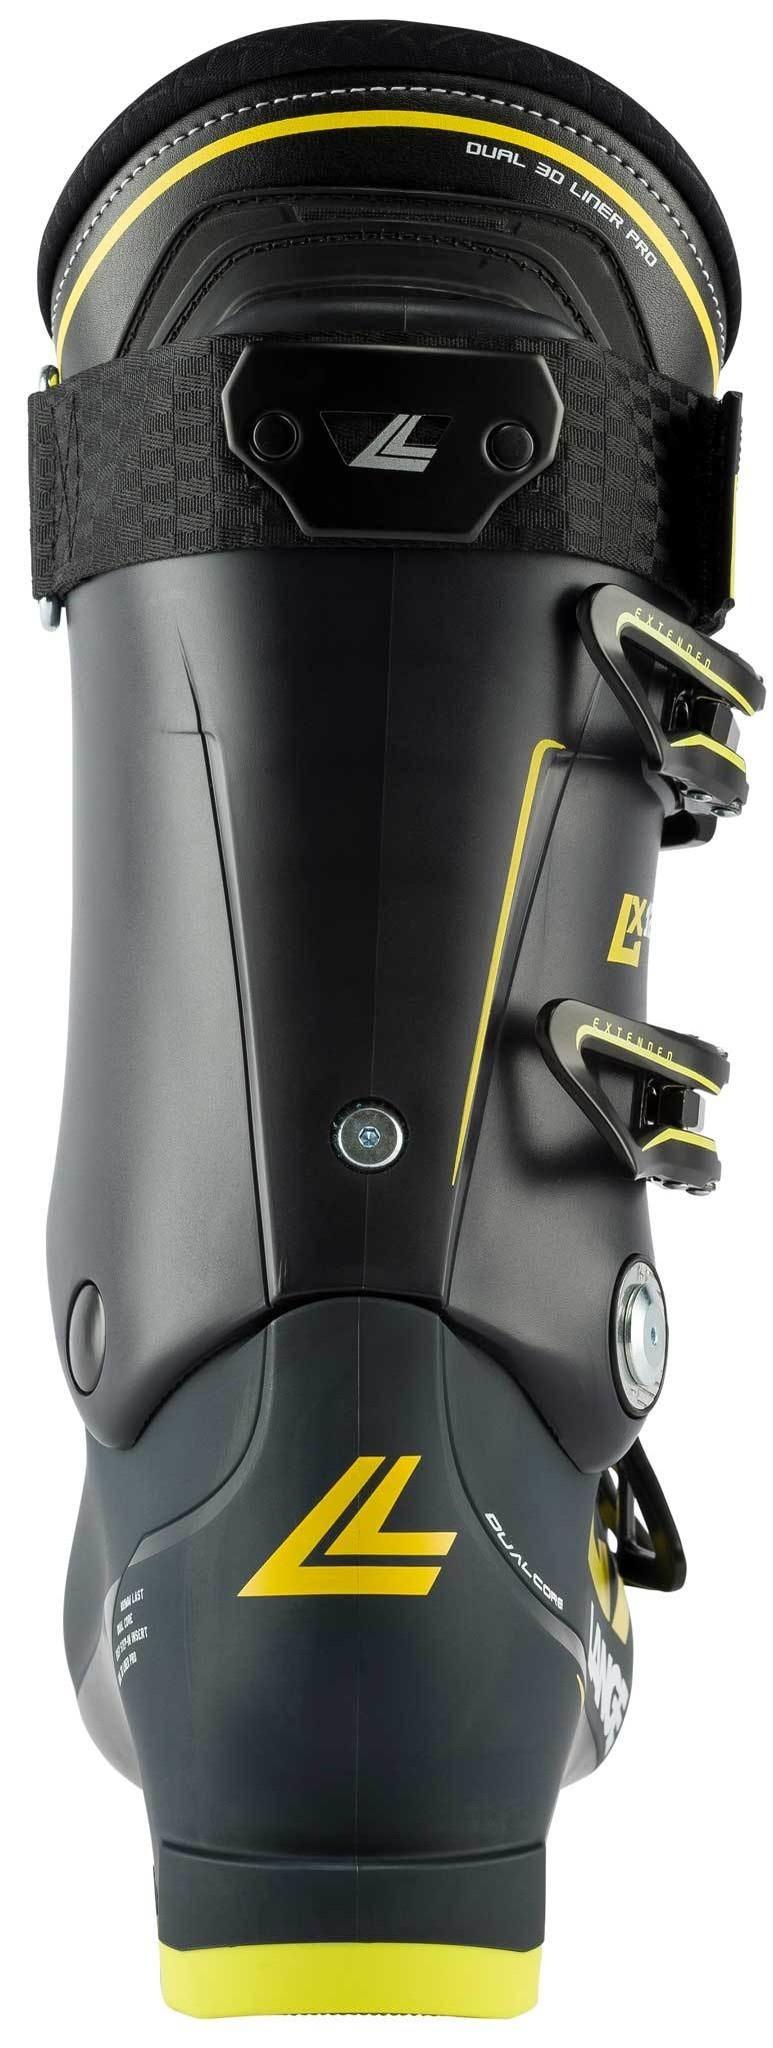 LX 120-2